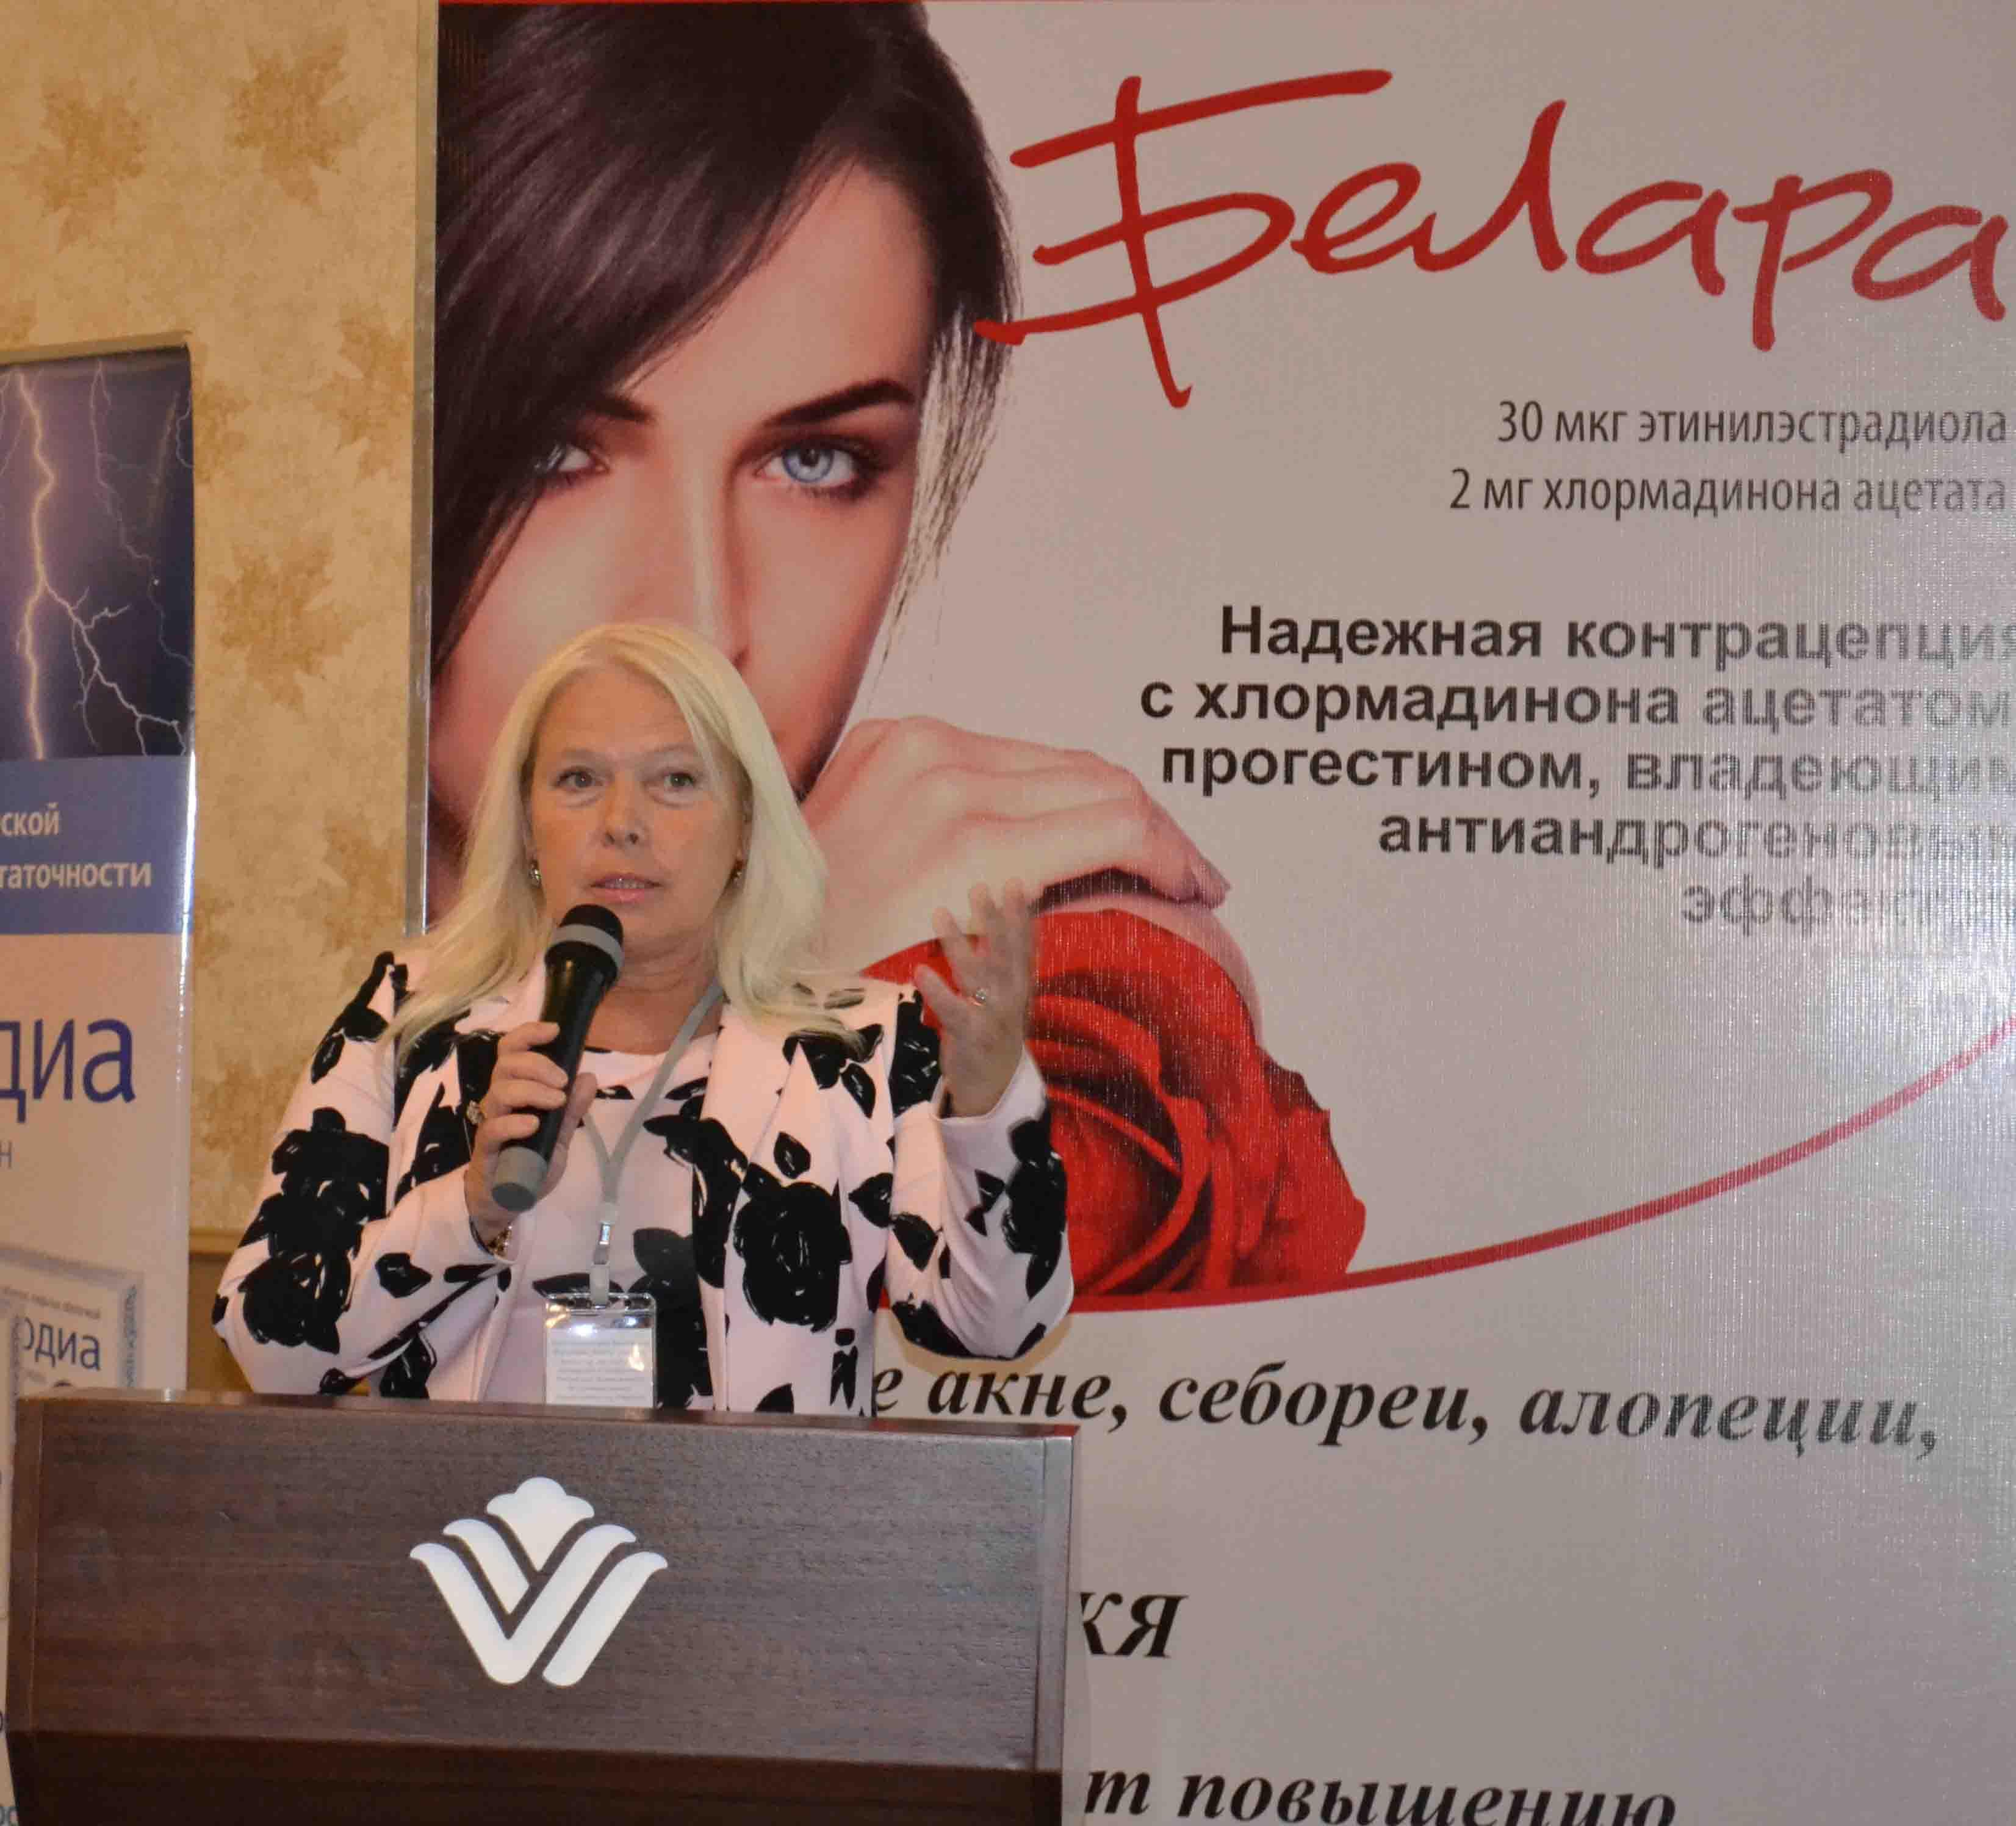 http://medicalexpress.ru/uploads/reportss/12346.jpg